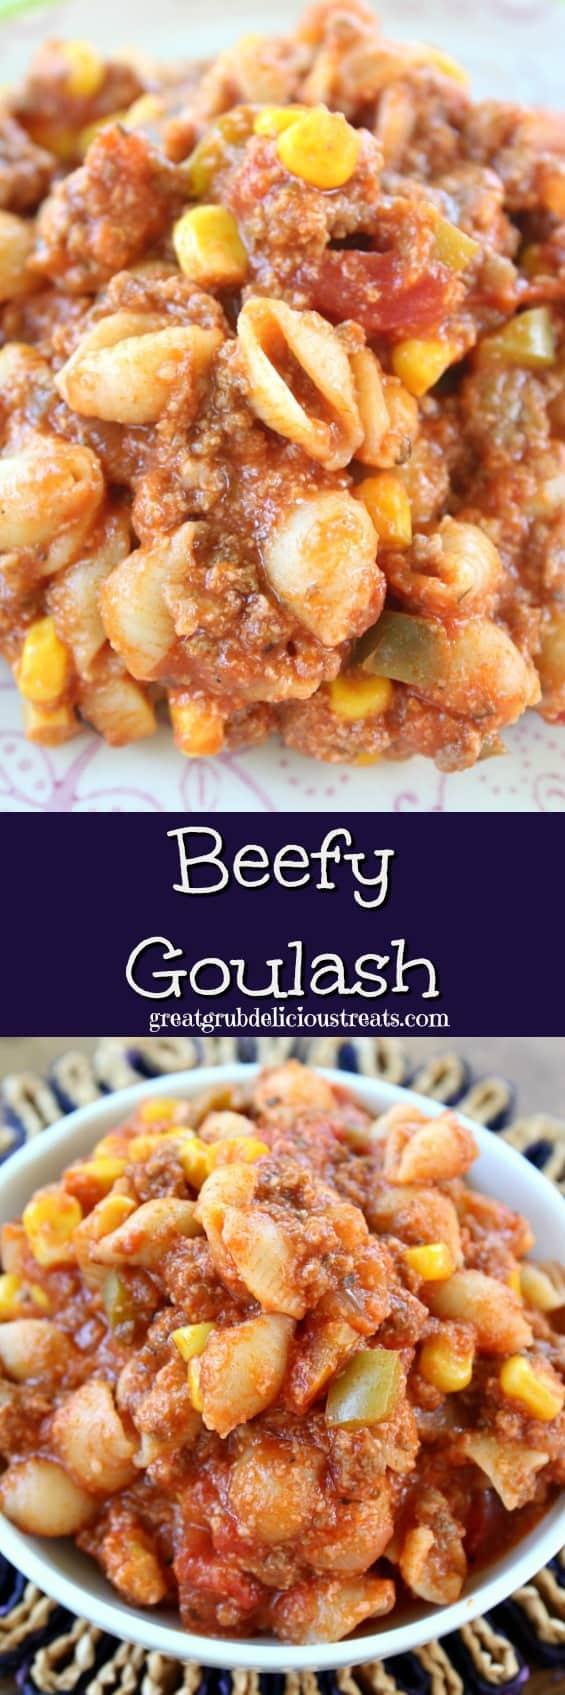 Beefy Goulash